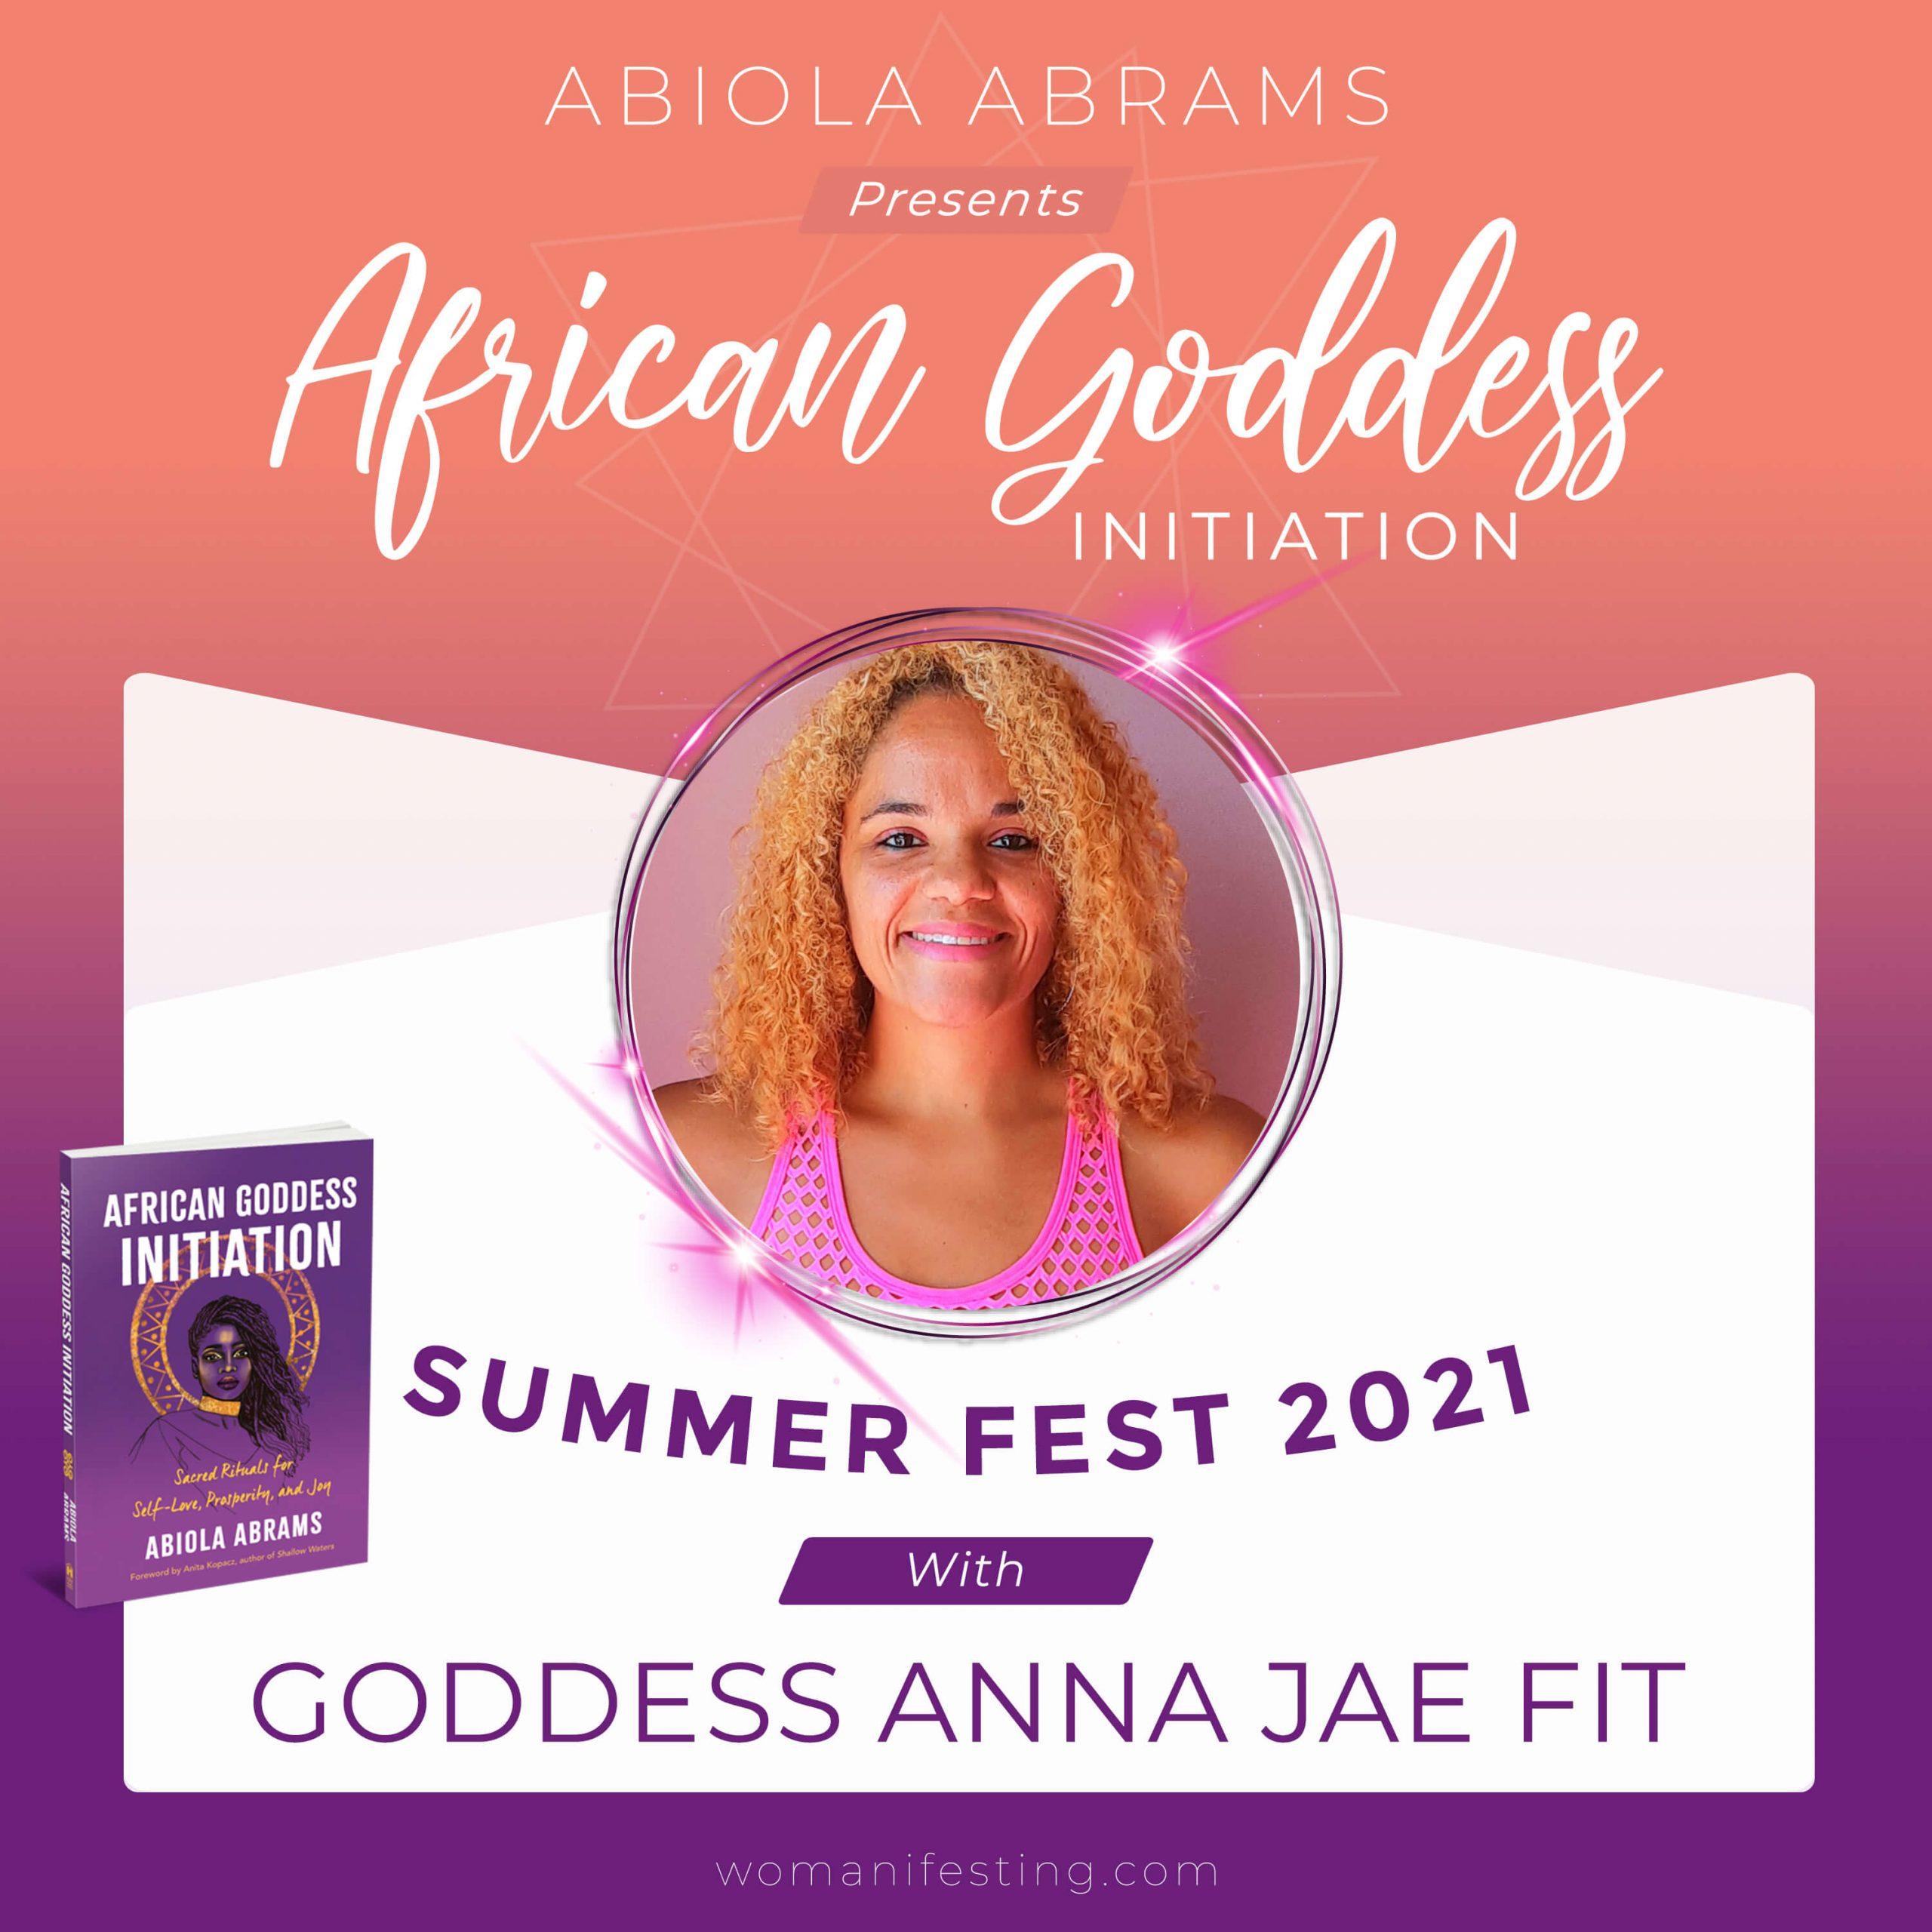 Goddess Anna Jae Fit: African Goddess Initiation Fest Guru